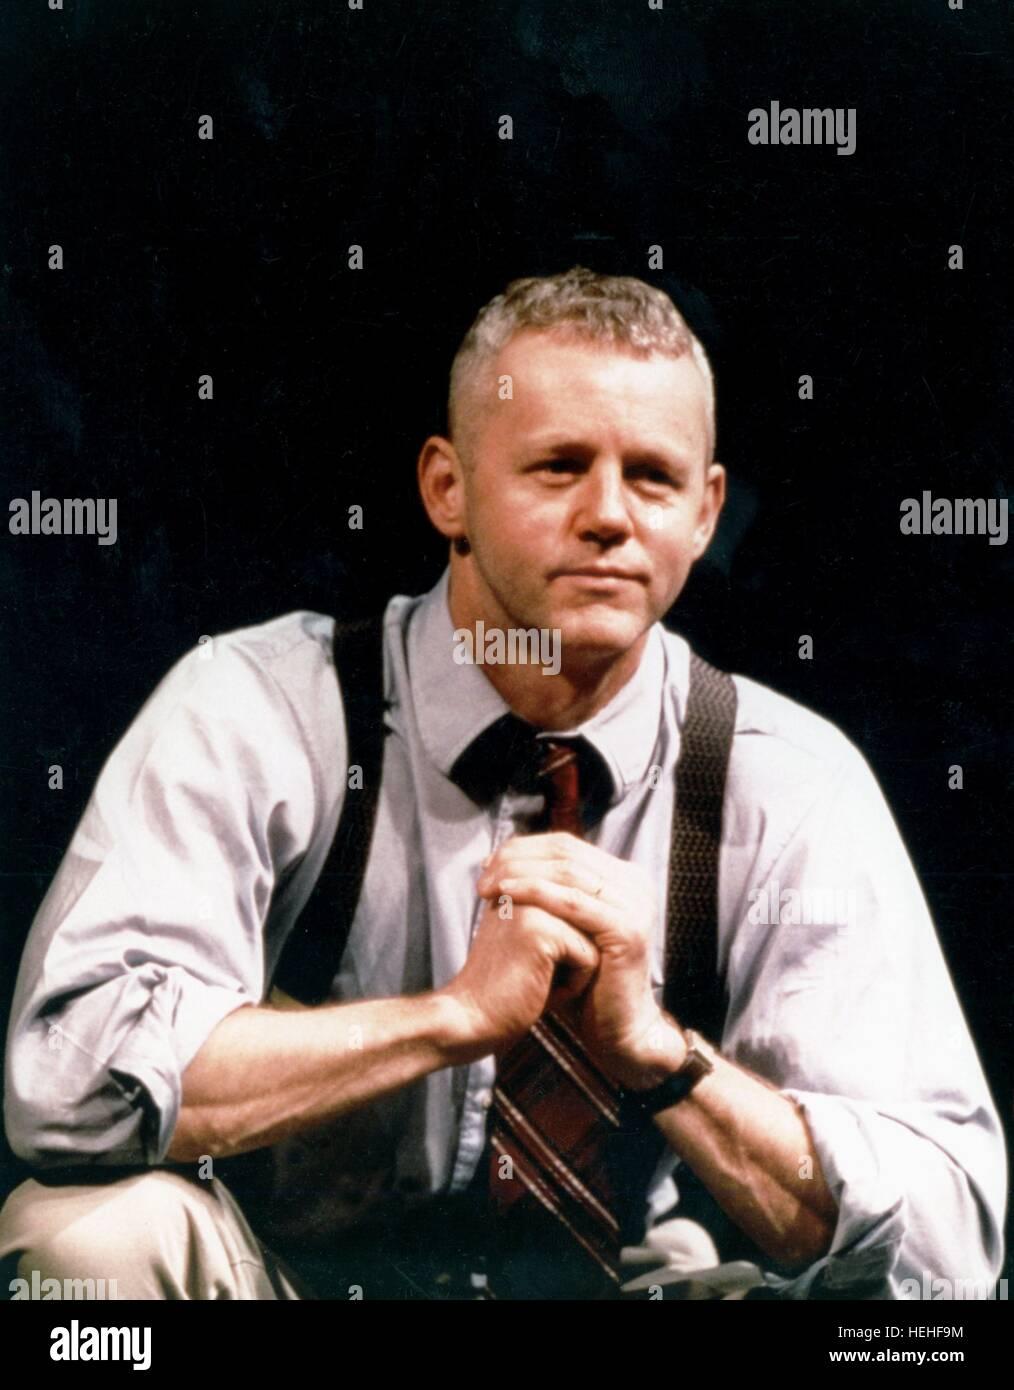 DAVID MORSE ACTOR (1999) - Stock Image